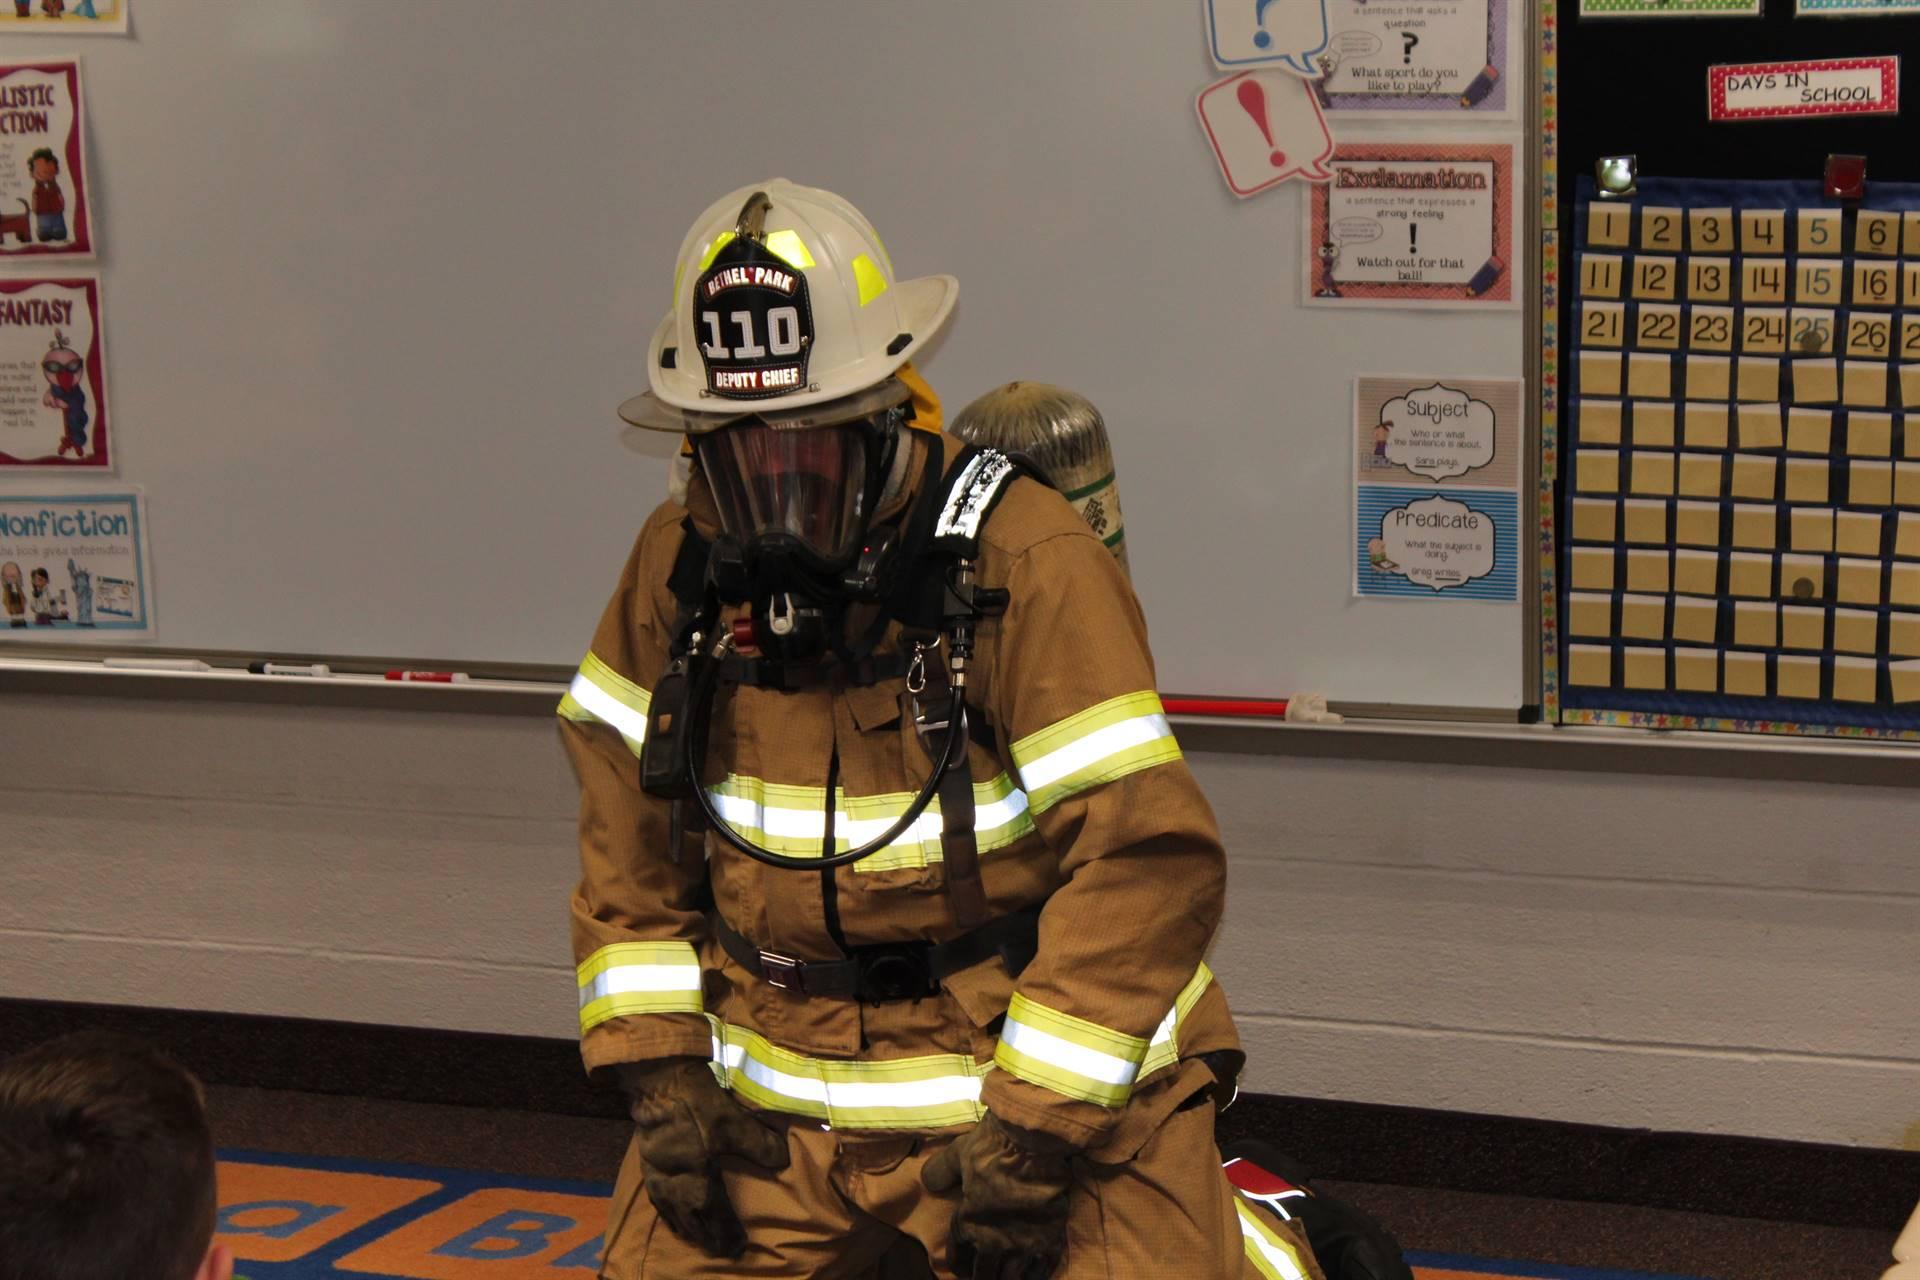 Fireman demonstrating getting low